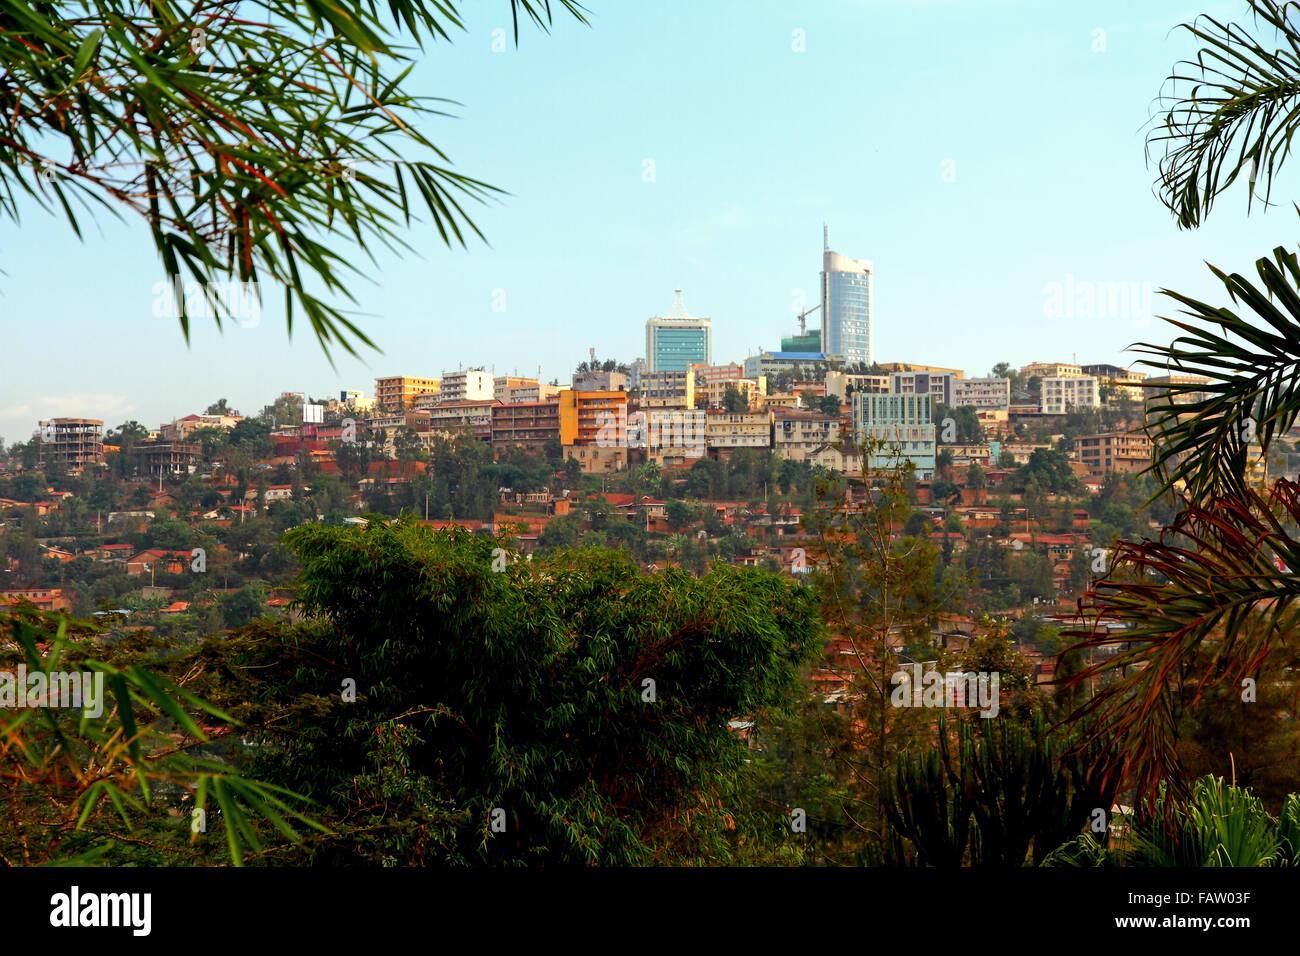 Downtown Kigali, Rwanda framed by trees - Stock Image